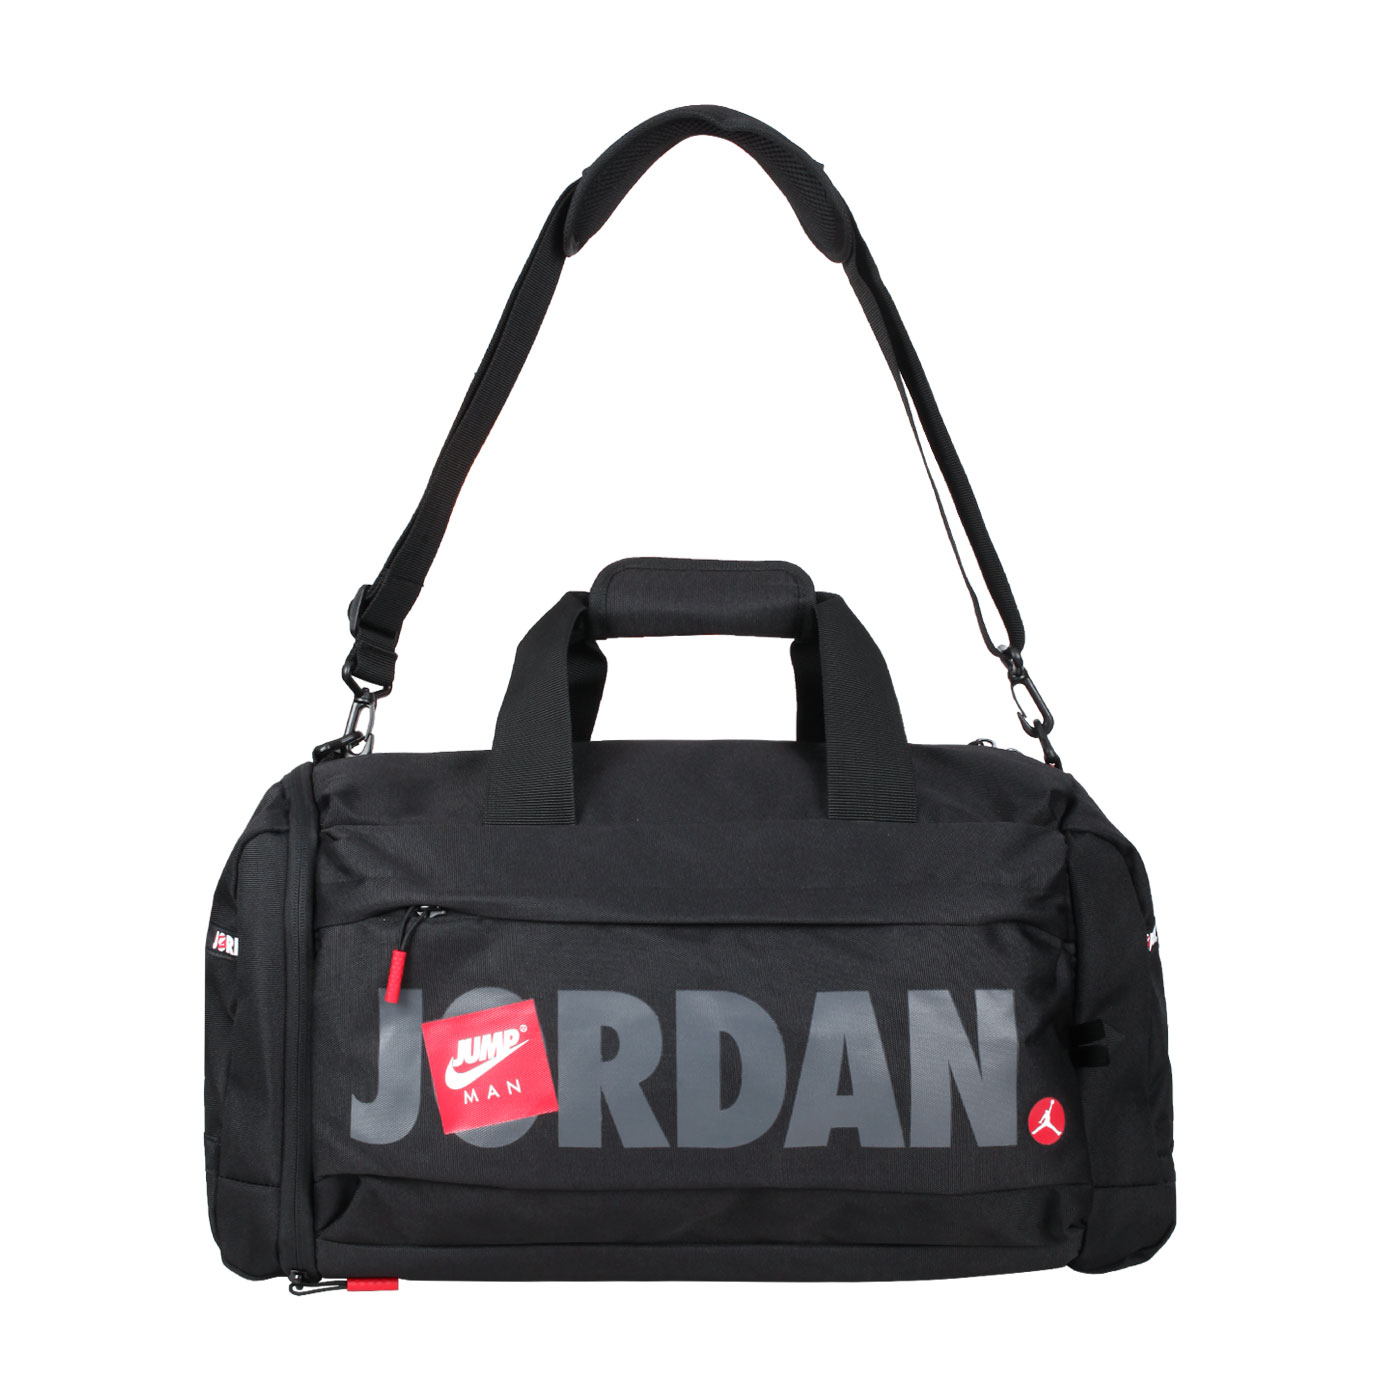 NIKE JORDAN 大型旅行袋 JD2113020AD-001 - 黑灰紅